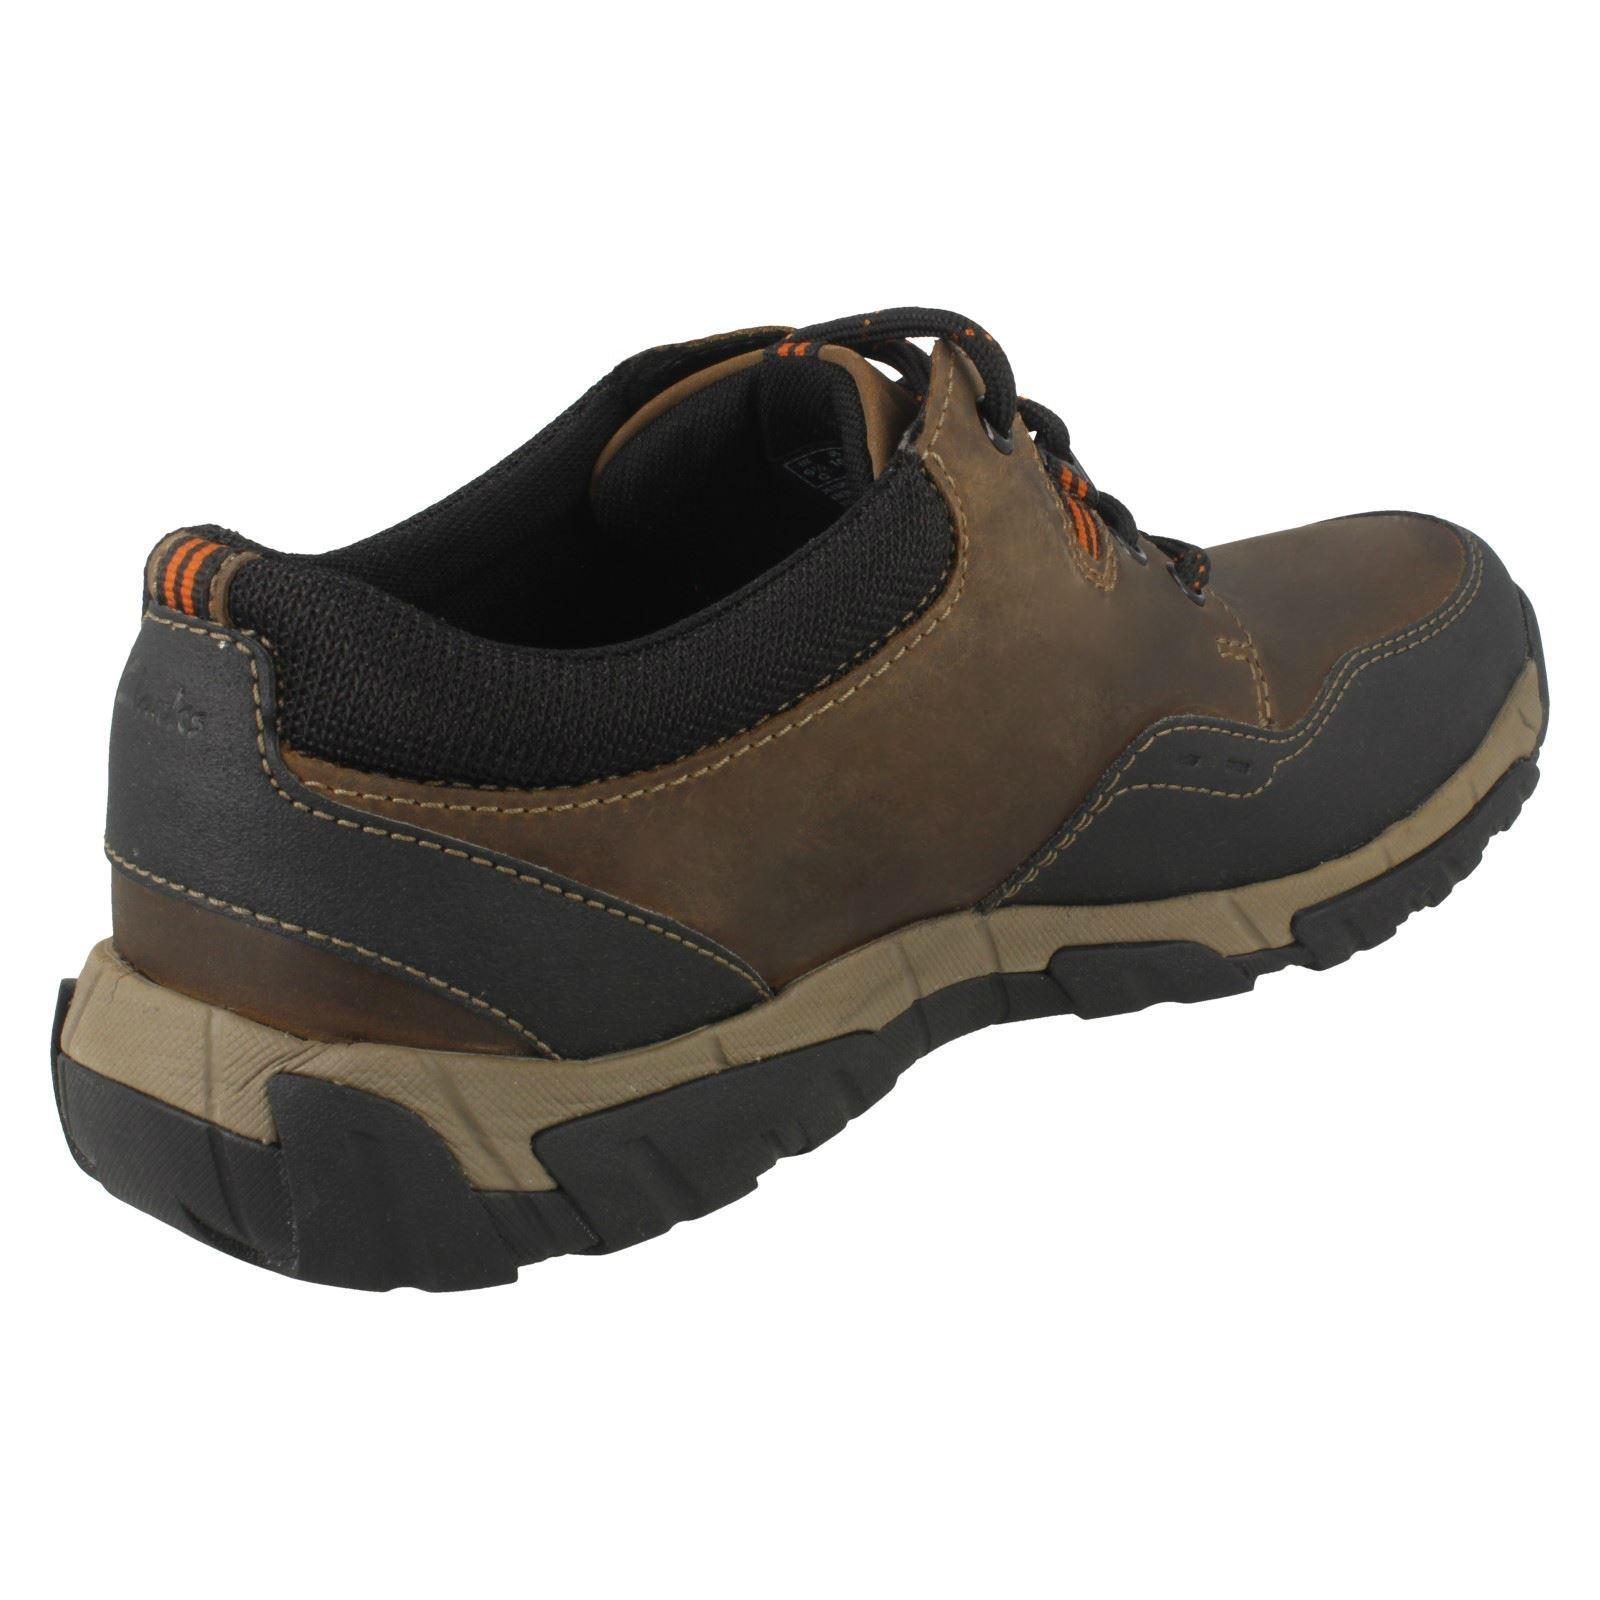 Para Hombre Clarks Impermeable Casual Con Cordones Estilo-Walbeck Estilo-Walbeck Cordones Edge II 36ef5a